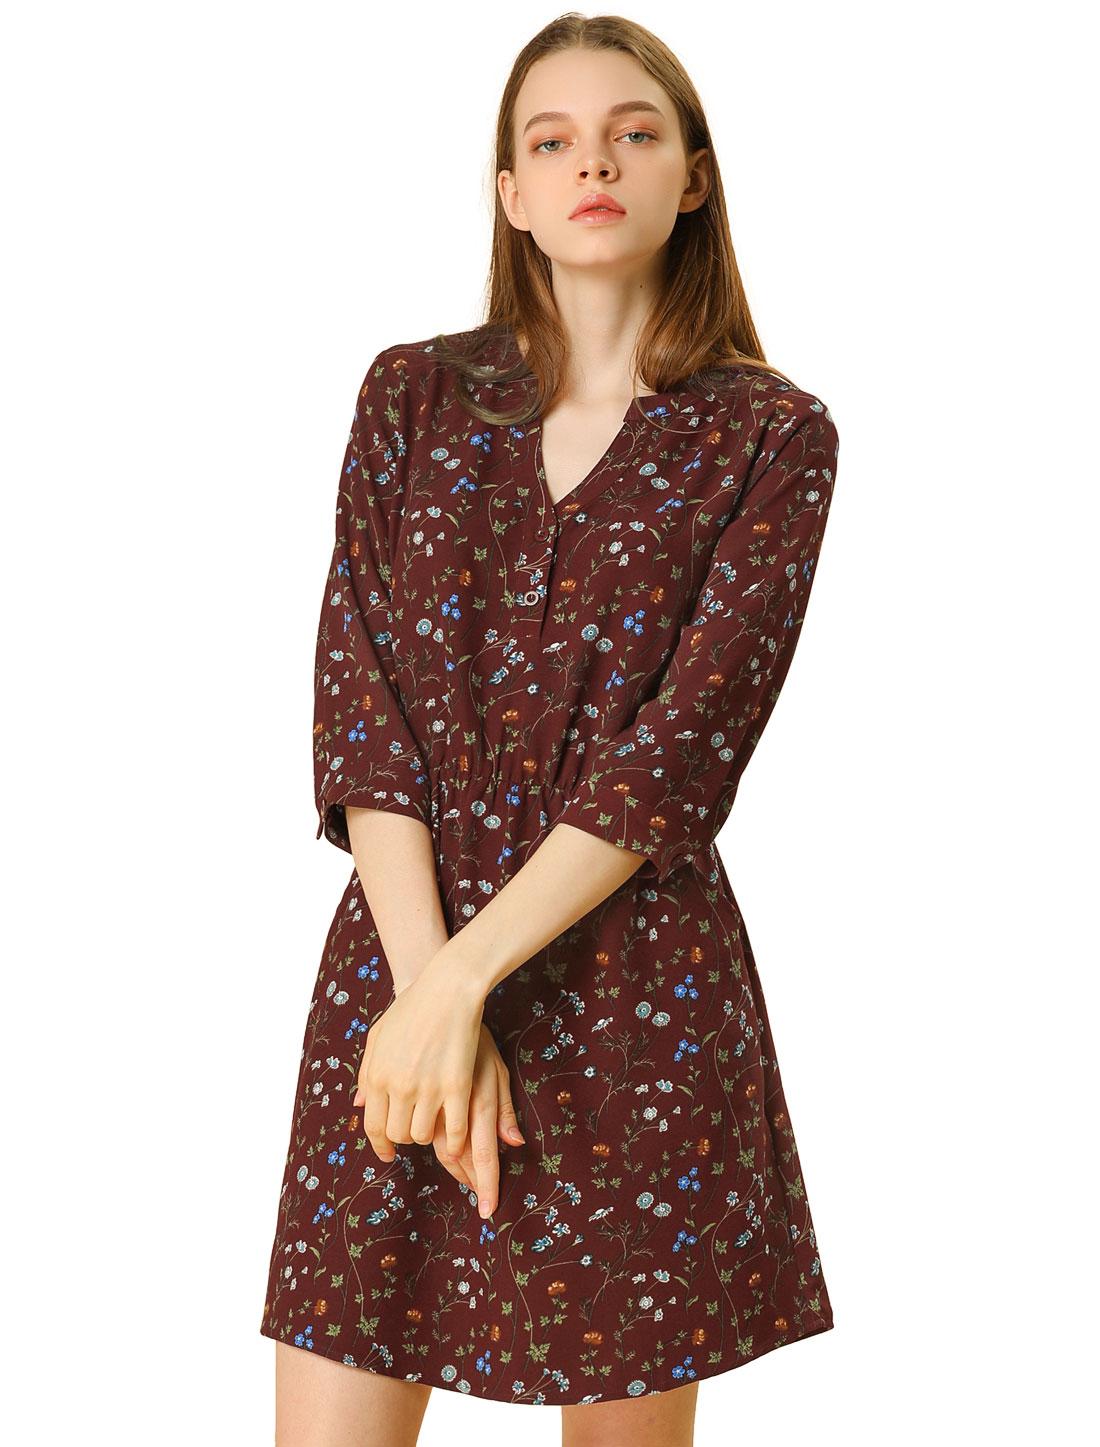 Allegra K Women Button Down V Neck Side Pockets Floral Dress Purplish Red L